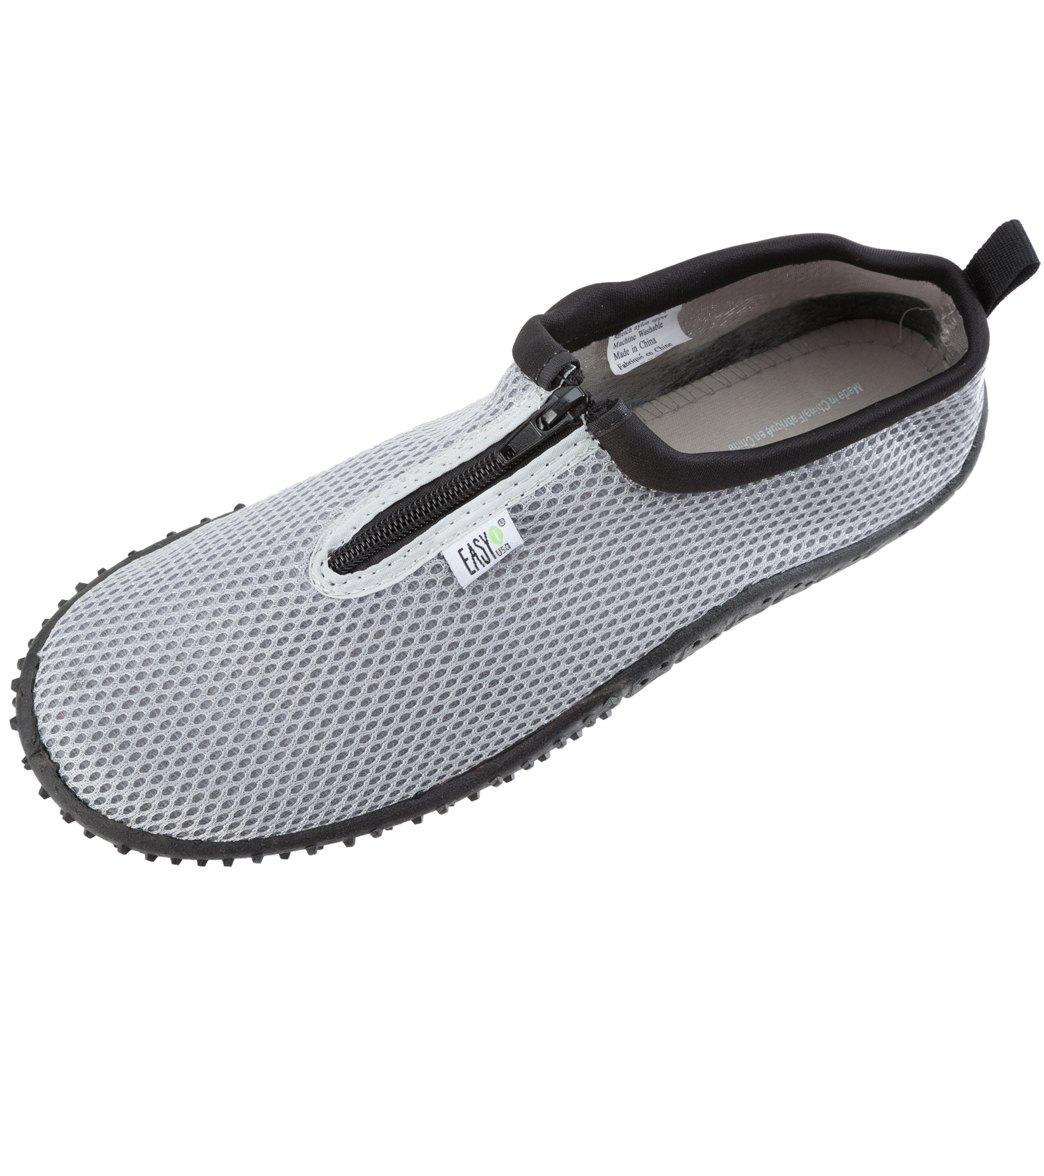 Easy USA Men's Zipper Water Shoe at